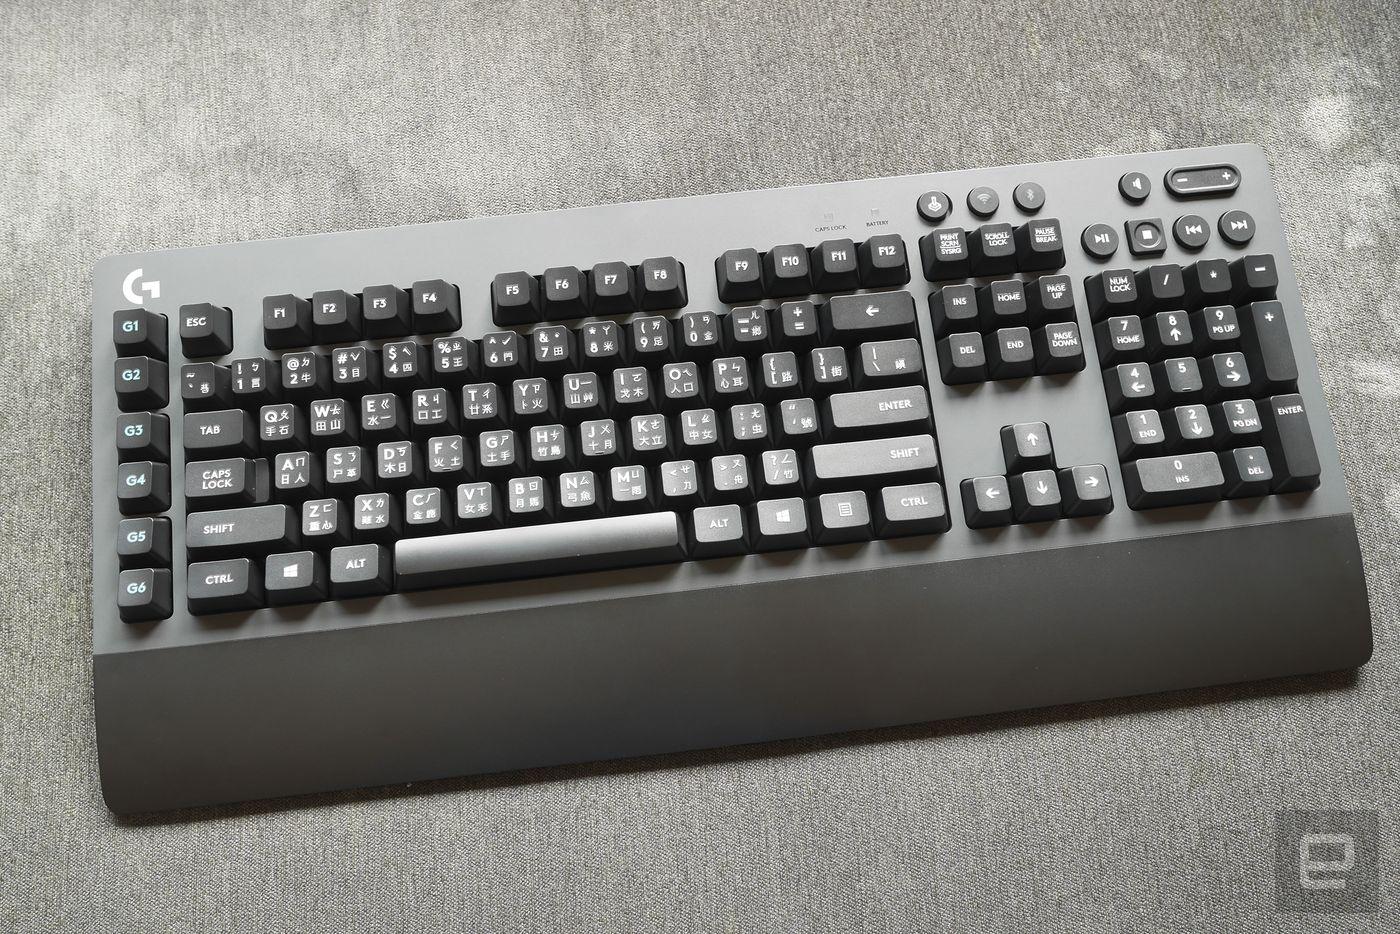 Logitech G603 無線滑鼠與 G613 無線機械鍵盤評測